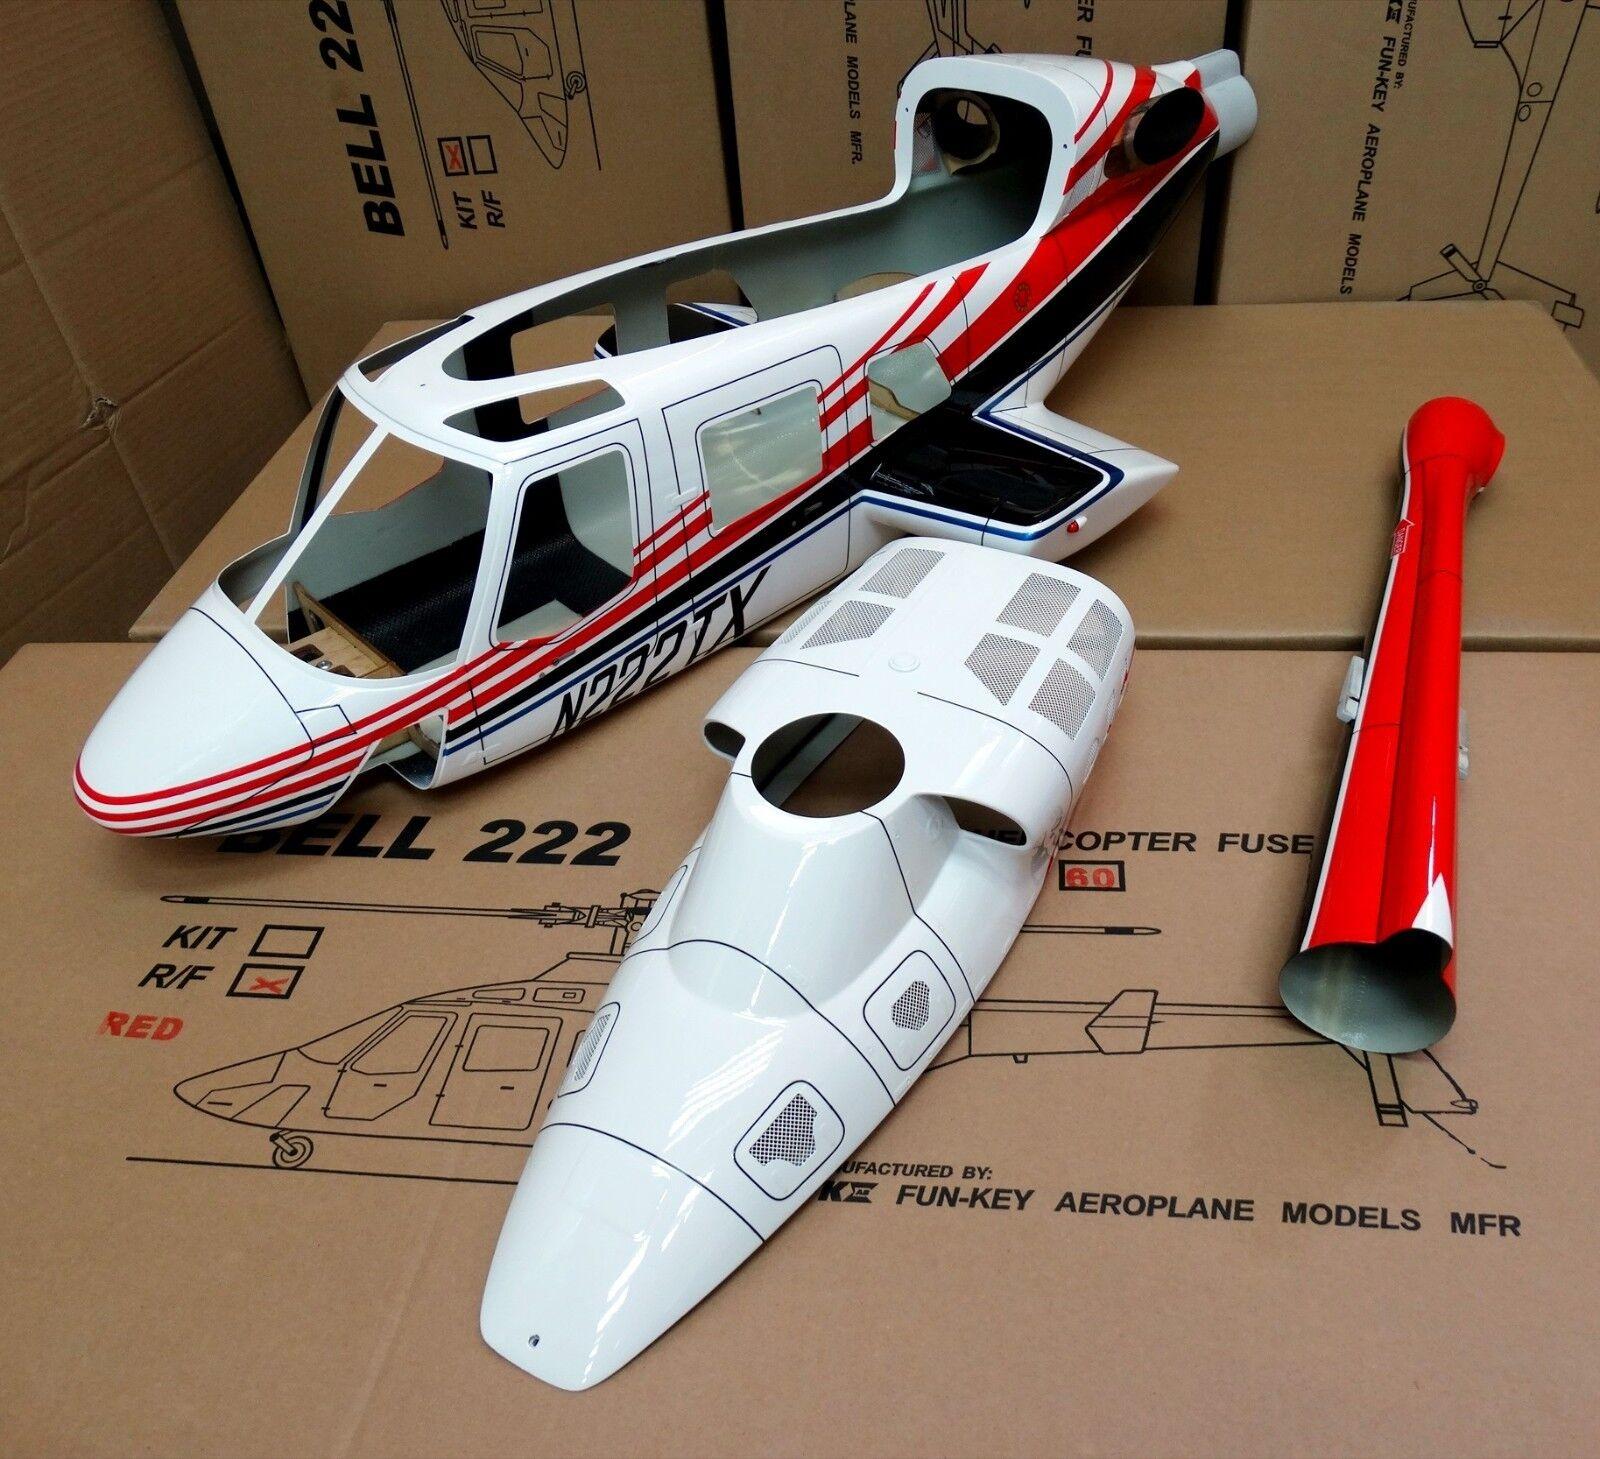 Nueva versión Funkey 700 tamaño Bell 222 escala fuselaje + retirar Rojo tren de aterrizaje